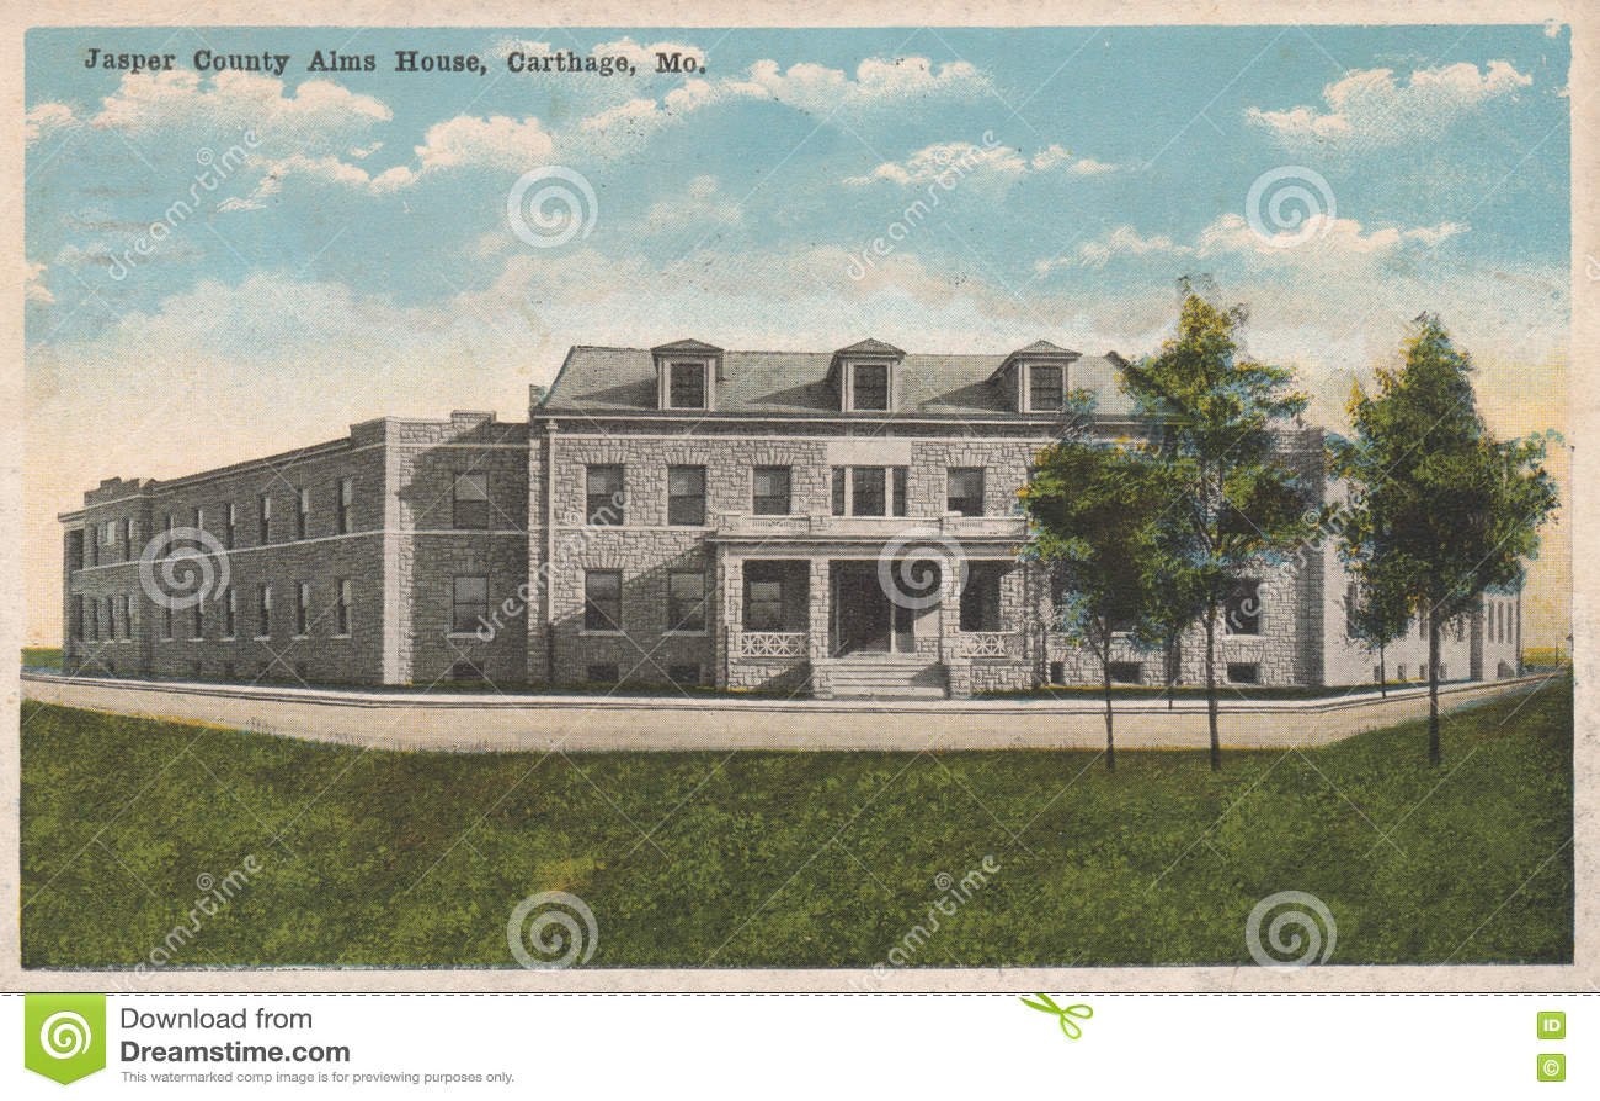 Jasper County Alms House Postcard Karthago MO